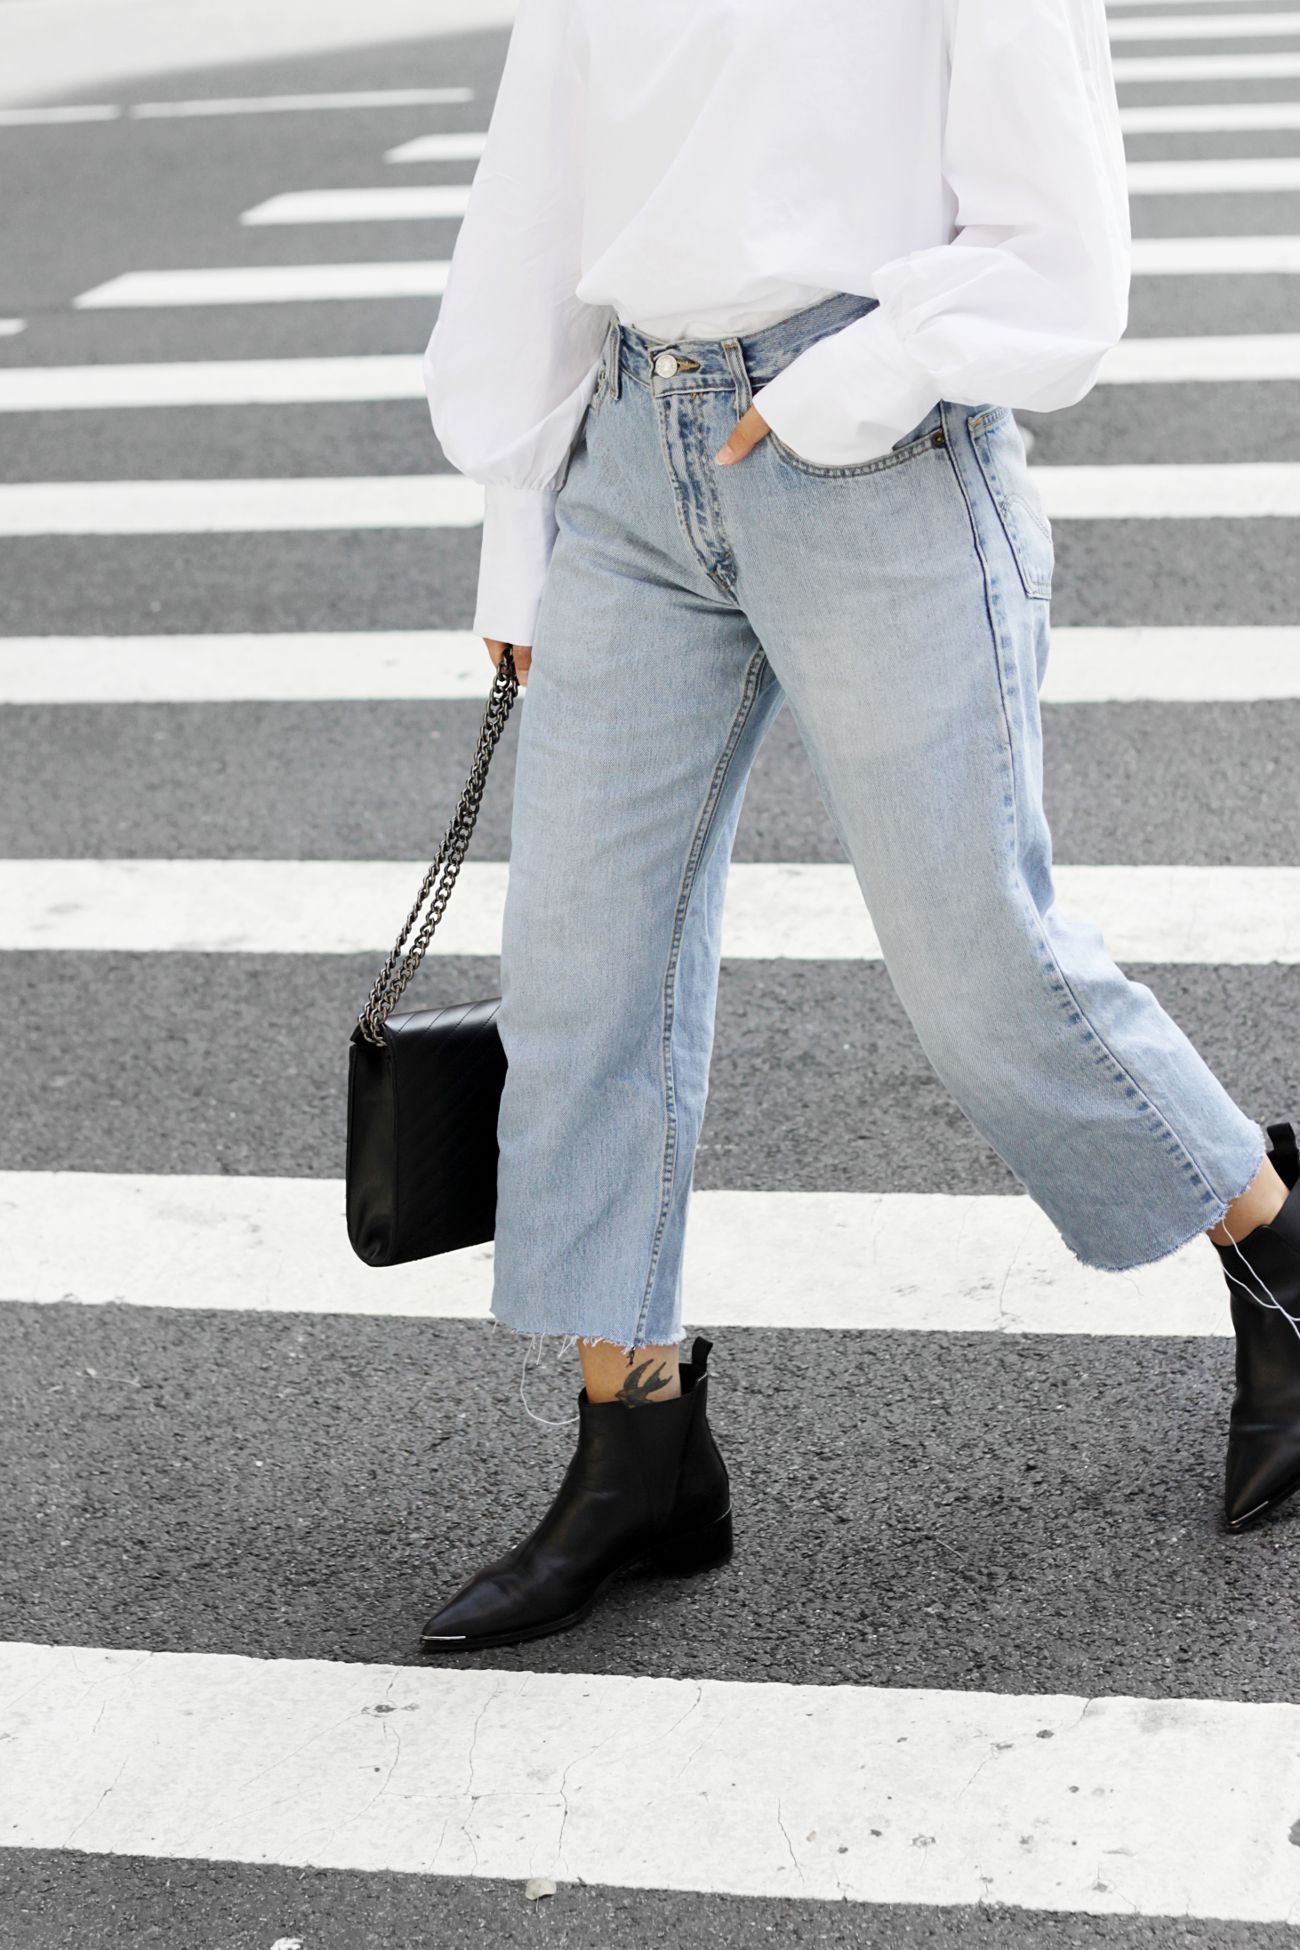 NYC streetstyle: Levis Vintage High Waist, Acne Studios Jensen Boots and Moss Copenhagen Bag.